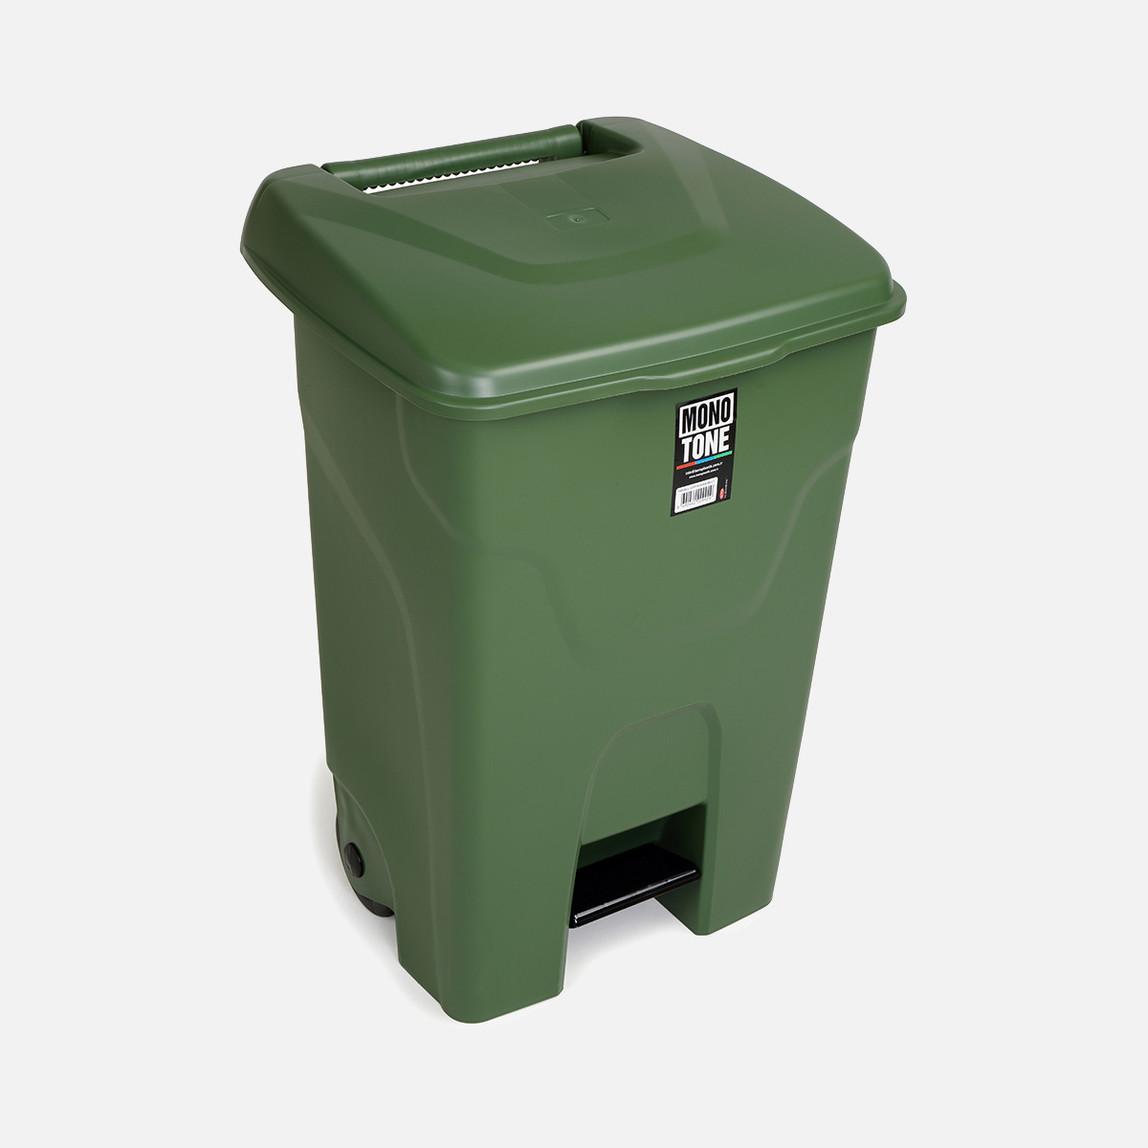 Bora Pedallı Çöp Kovası 80 Litre